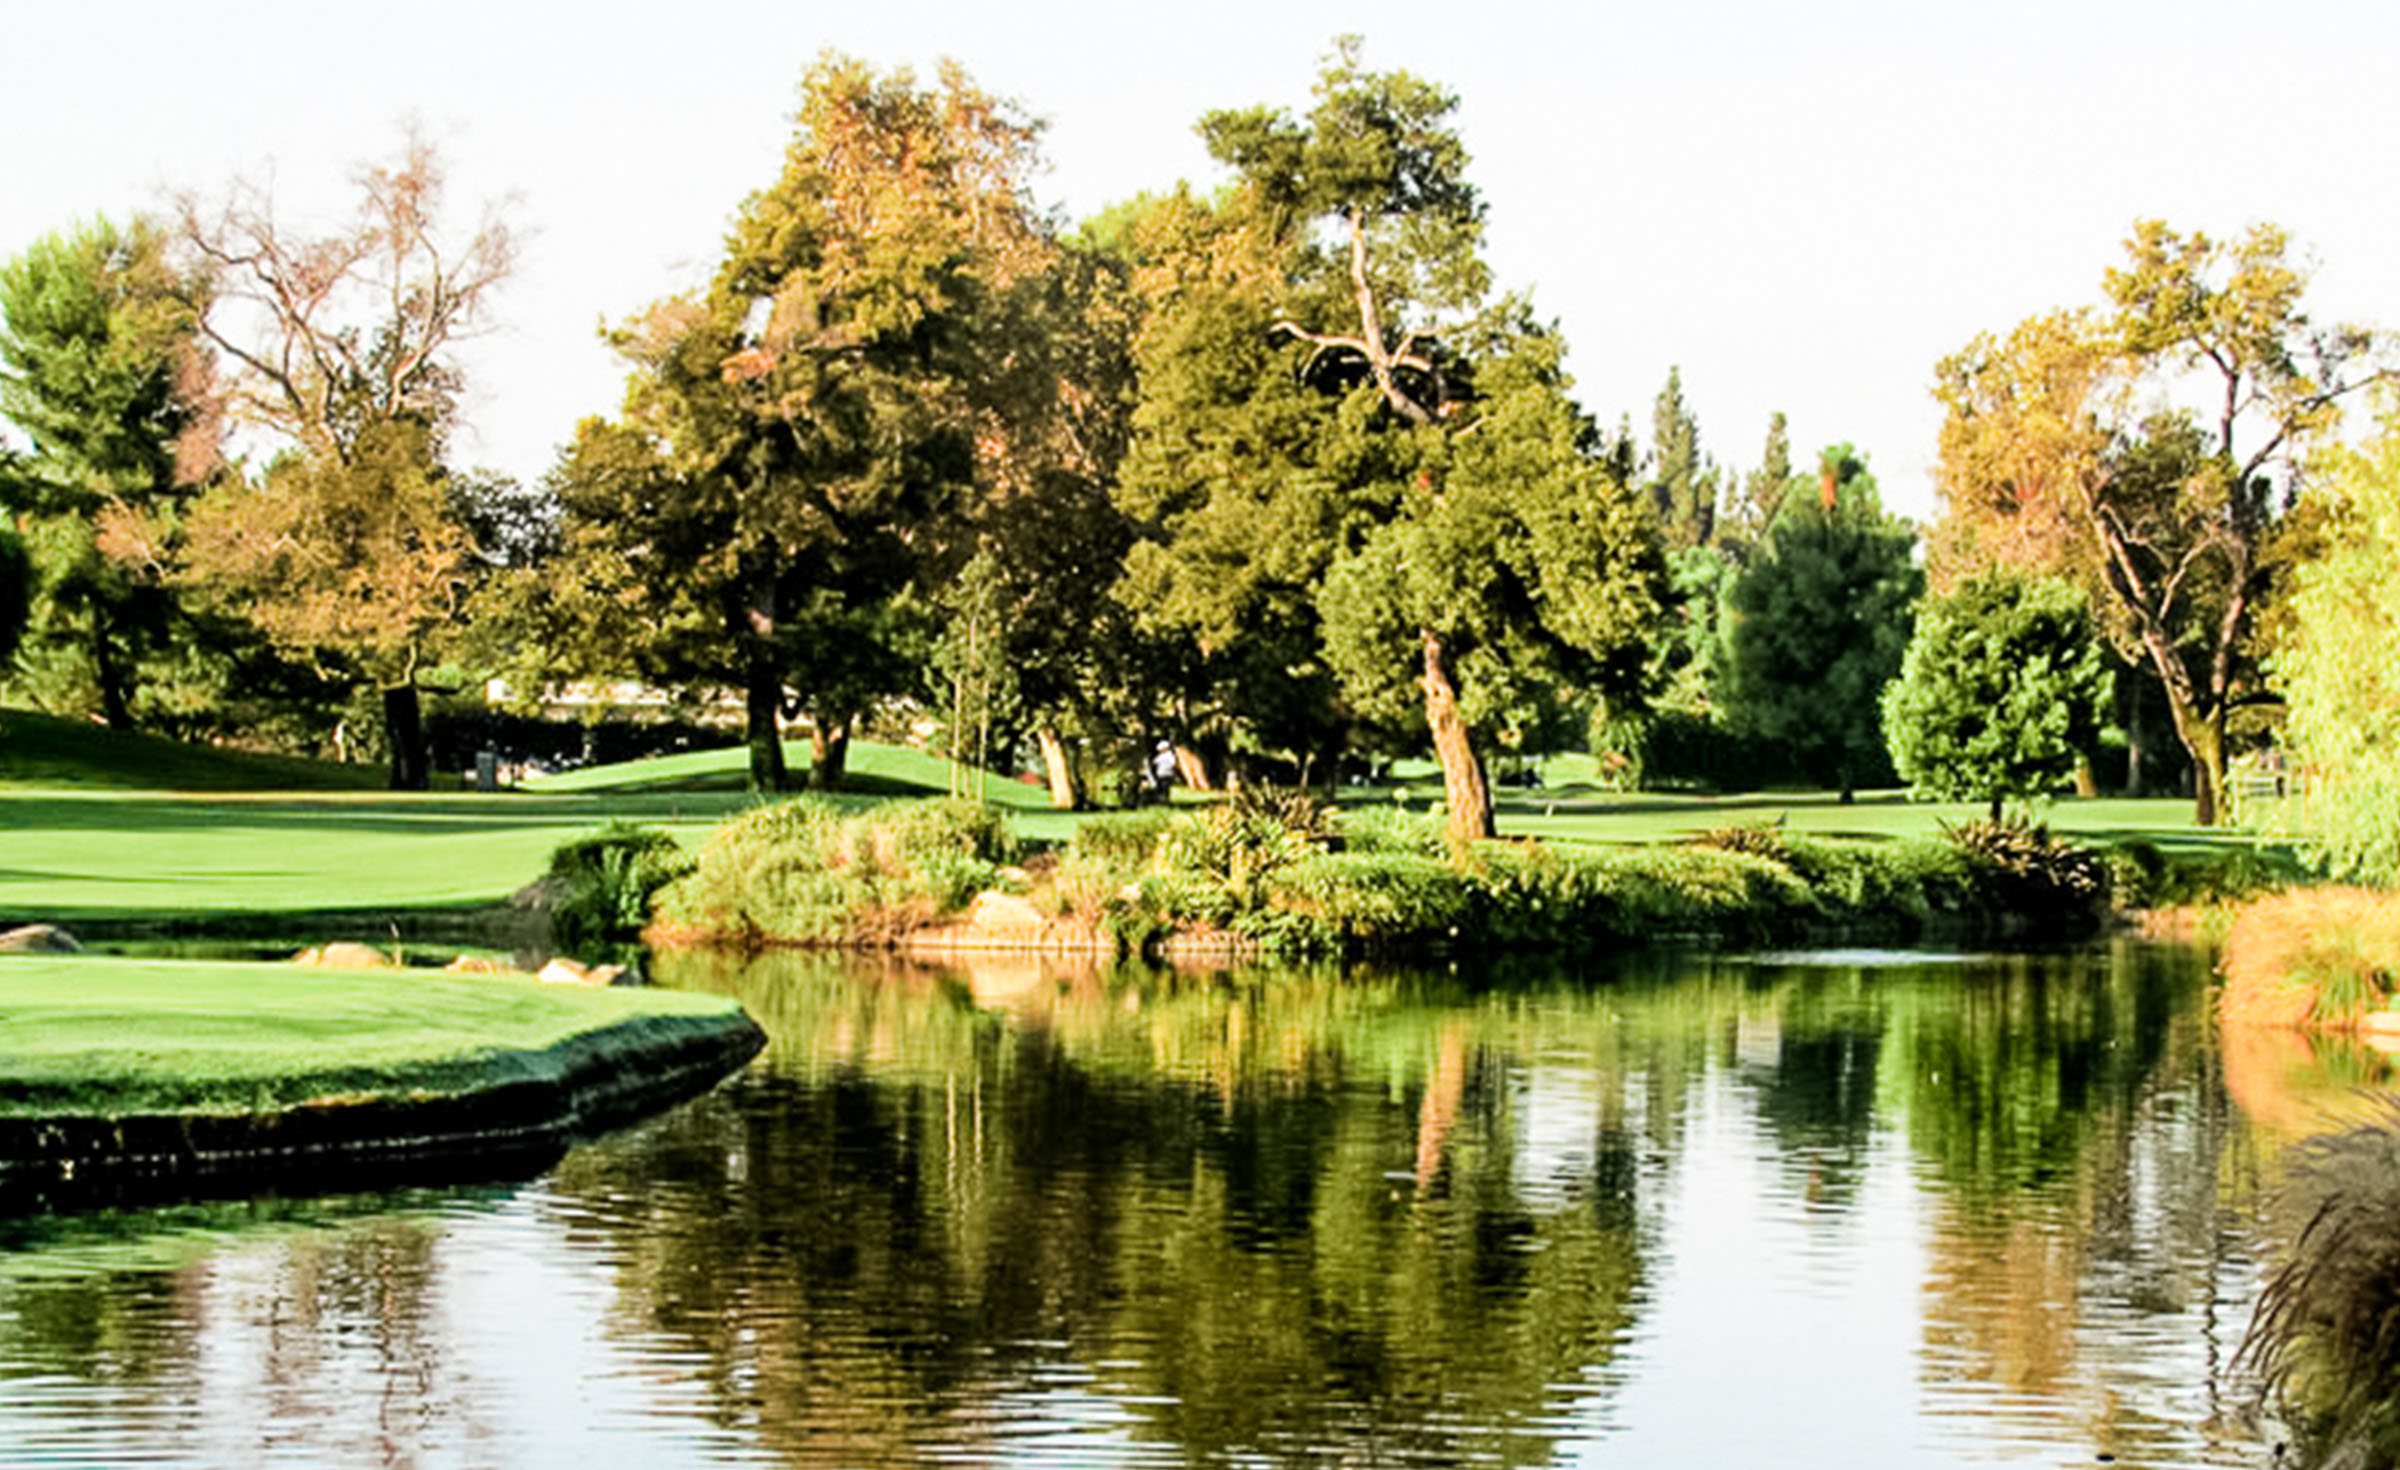 Lush Greenery -  Rio Hondo - Downey, California - Los Angeles County - Wedgewood  Weddings